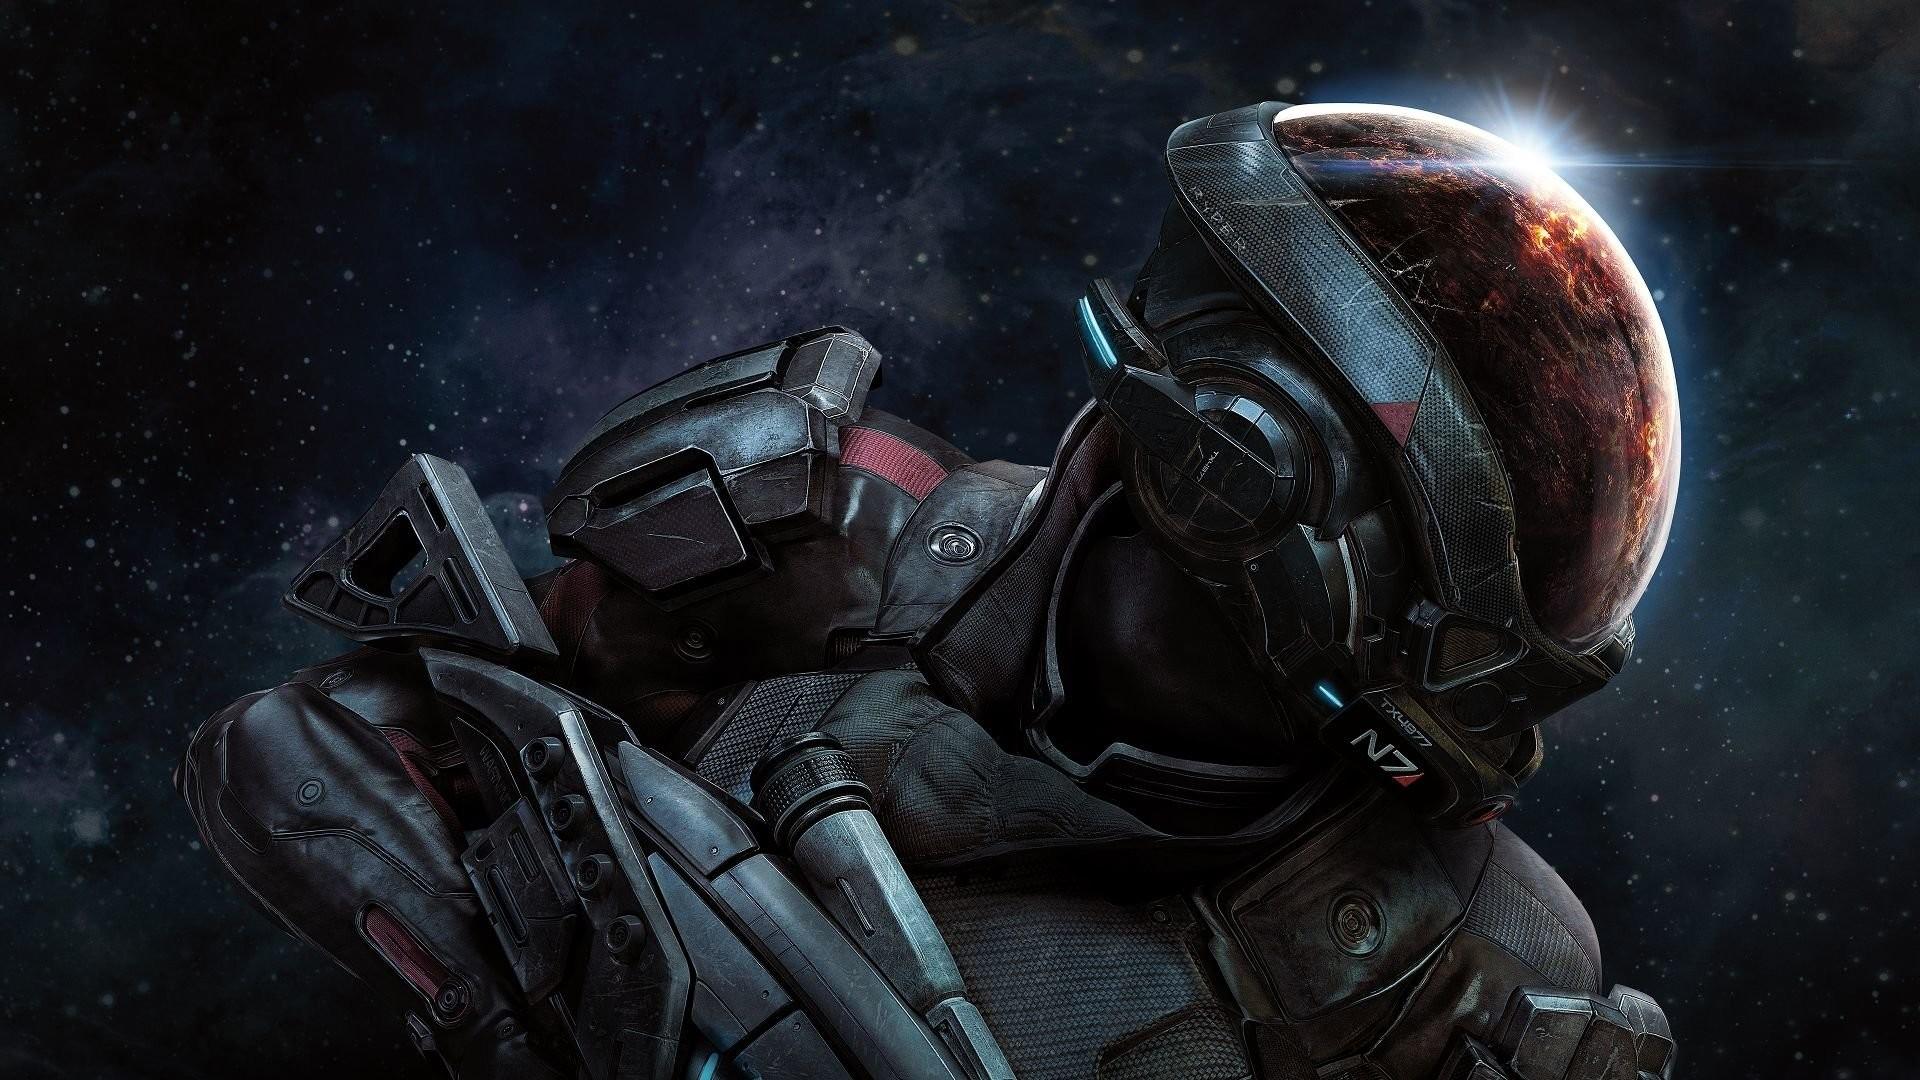 Video Game – Mass Effect: Andromeda Wallpaper